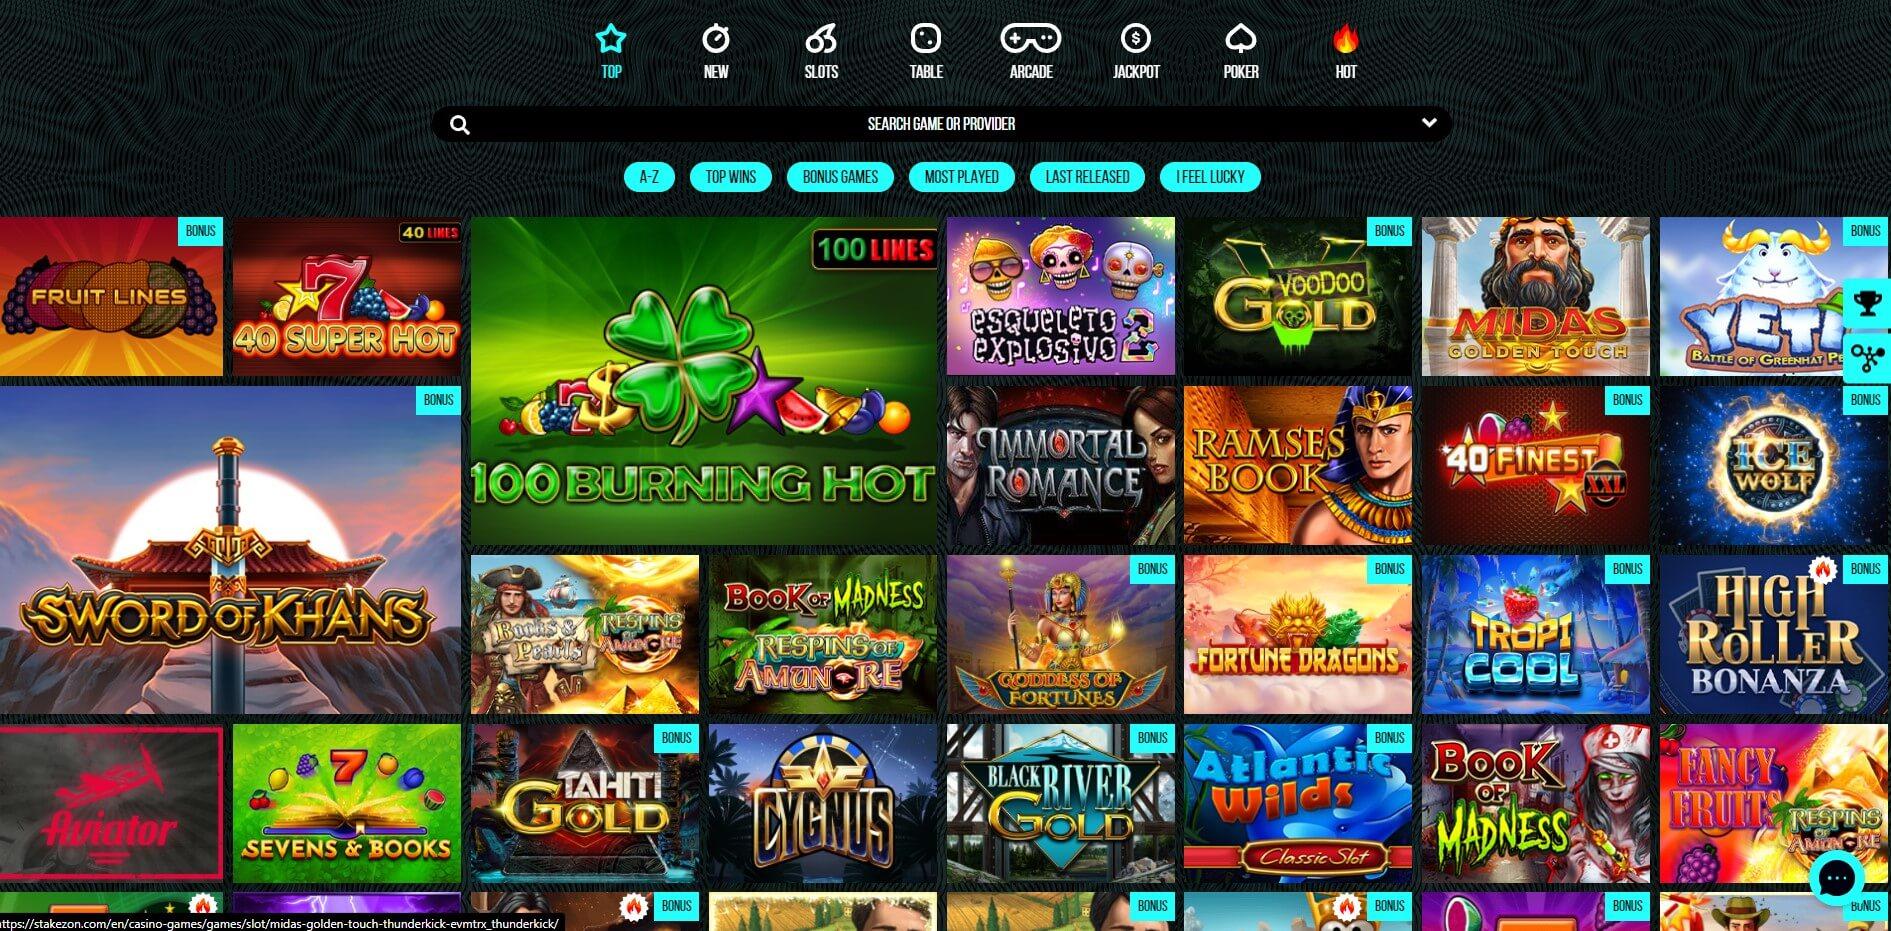 Games at Stakezon Casino